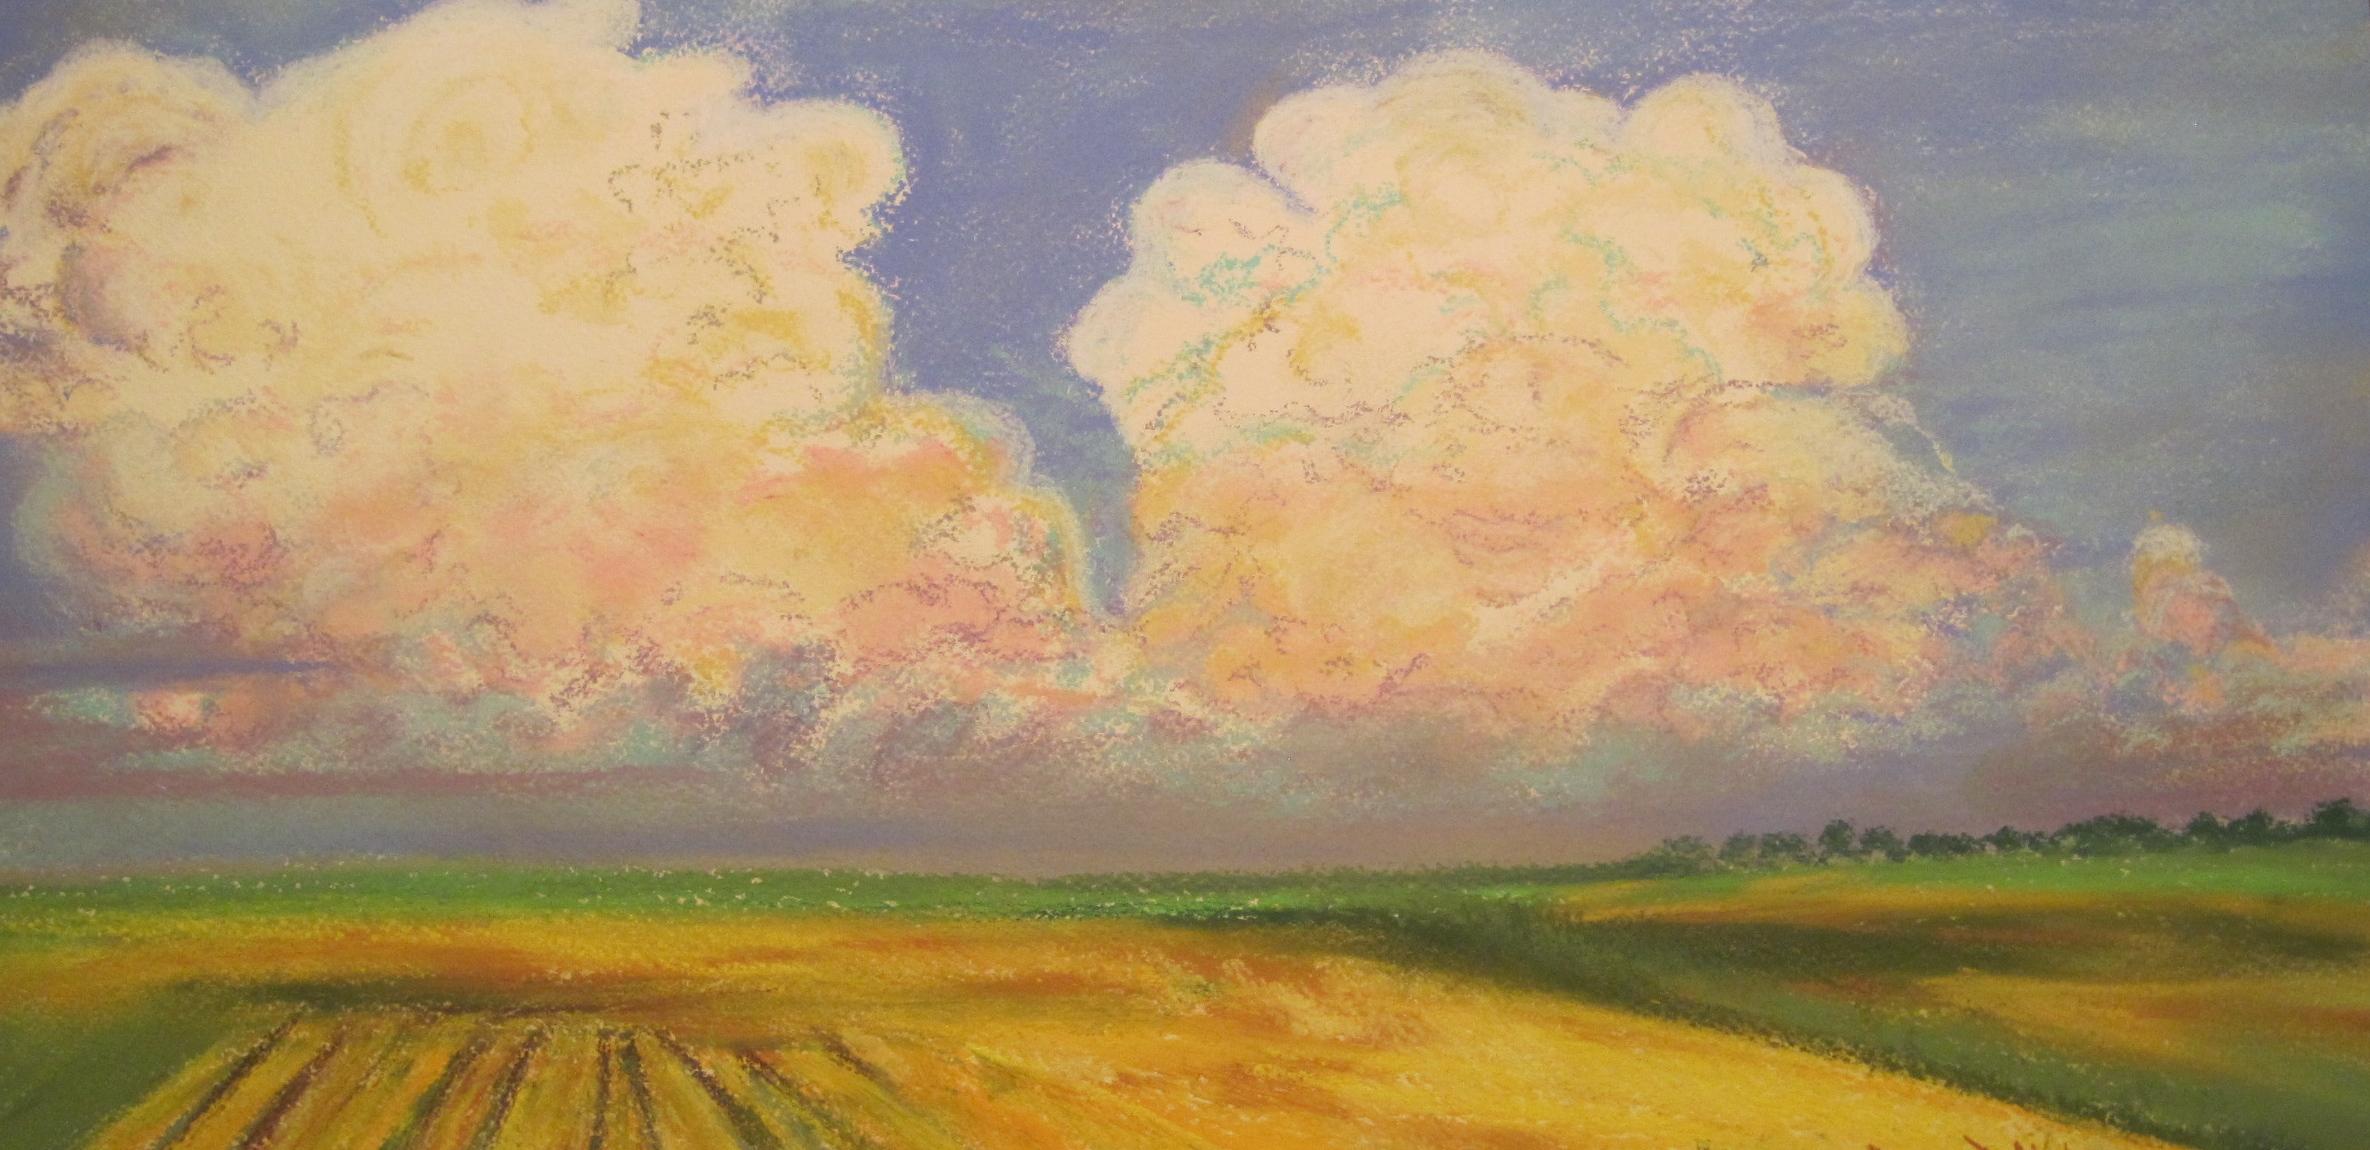 Big Puffy Popcorn Clouds by Julia Jaakola